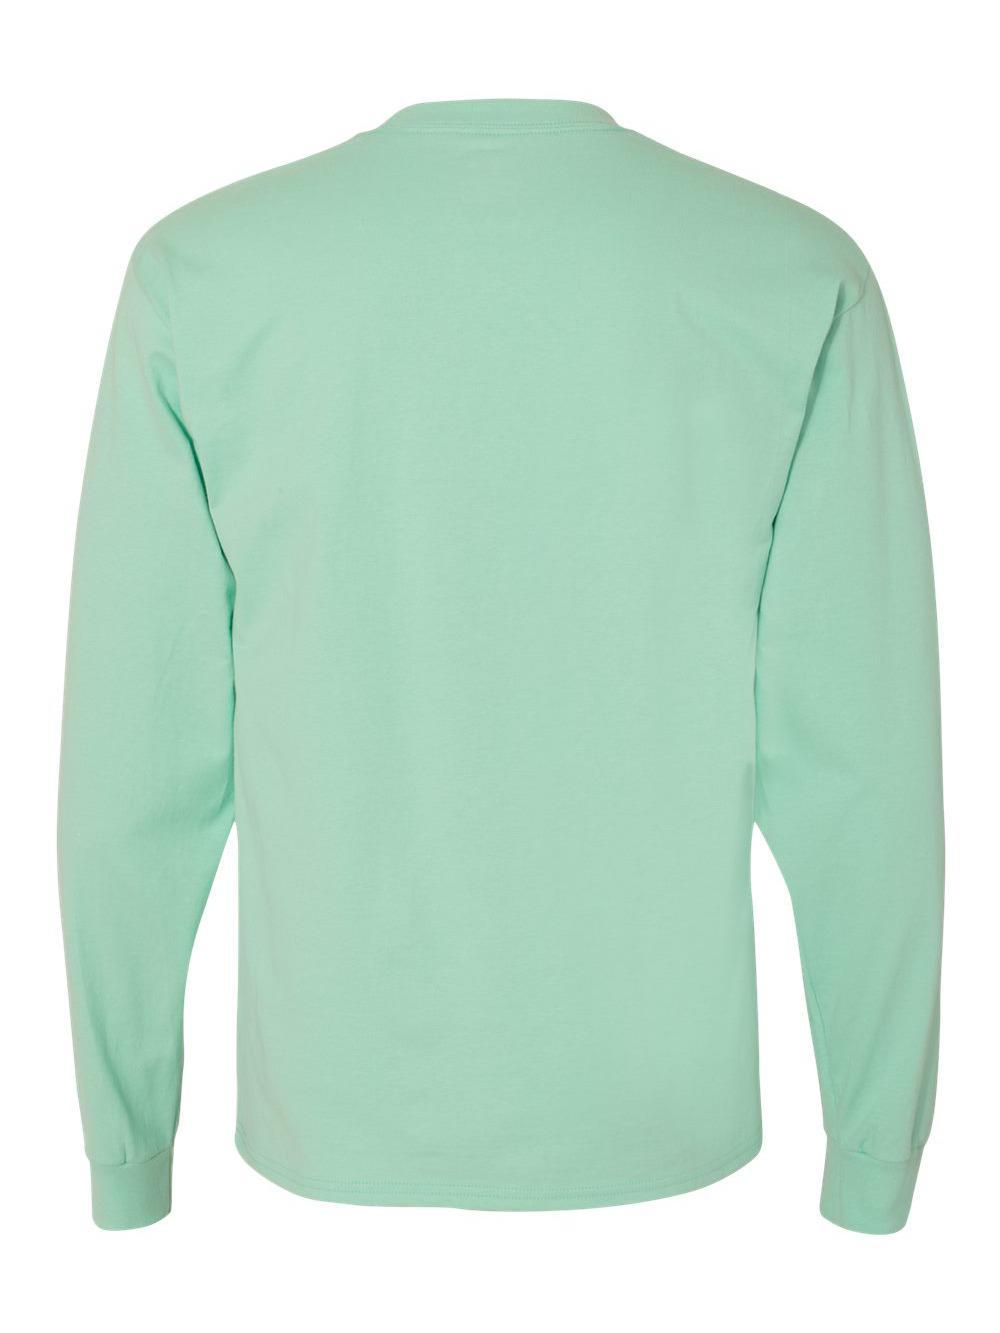 Hanes-Beefy-T-Long-Sleeve-T-Shirt-5186 thumbnail 22